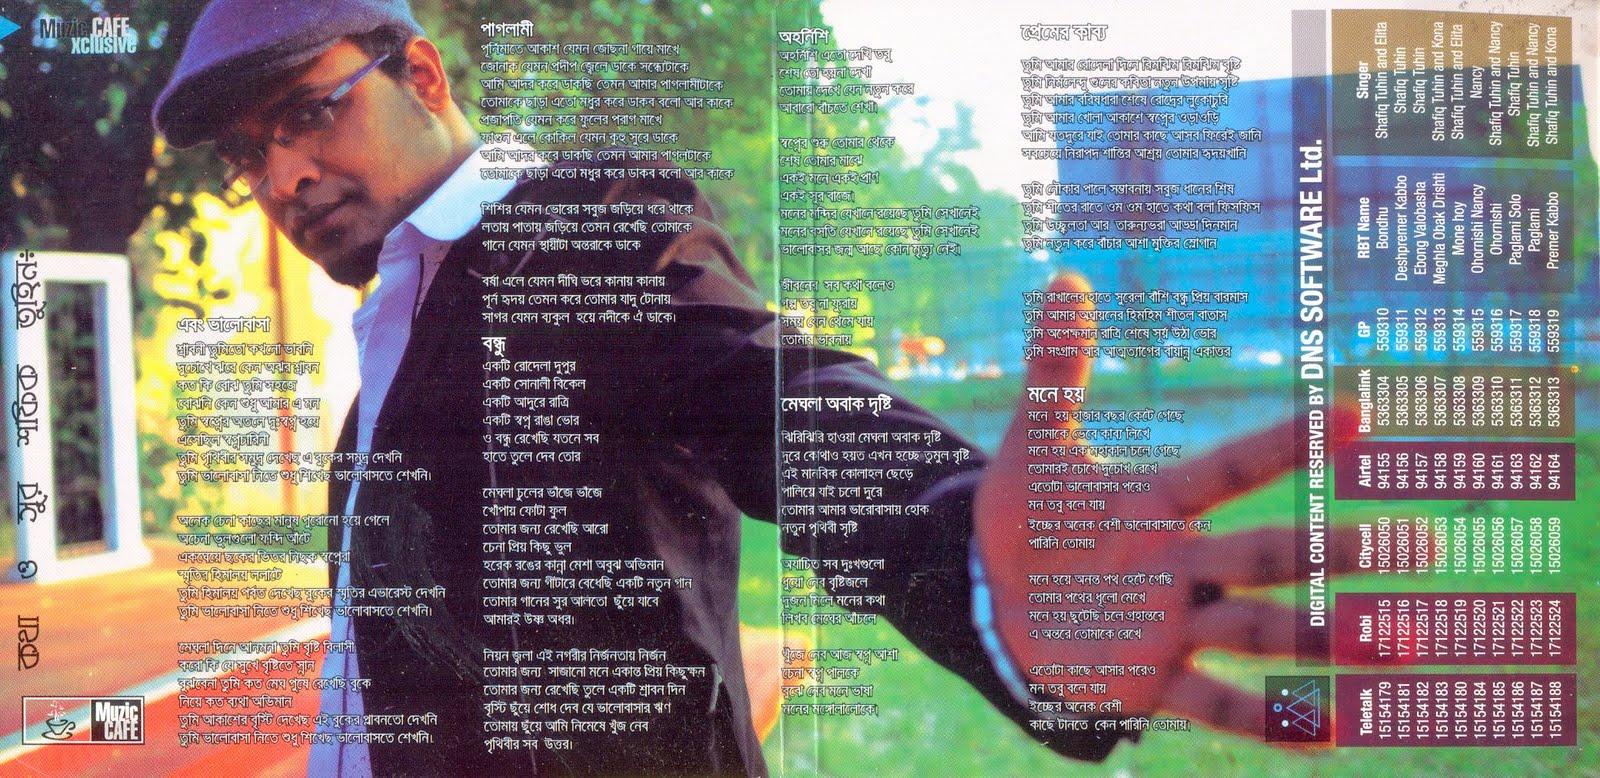 Paglame (2012)- Shafiq Tuhin Feat Kona, Elita & Nancy Mp3 Download